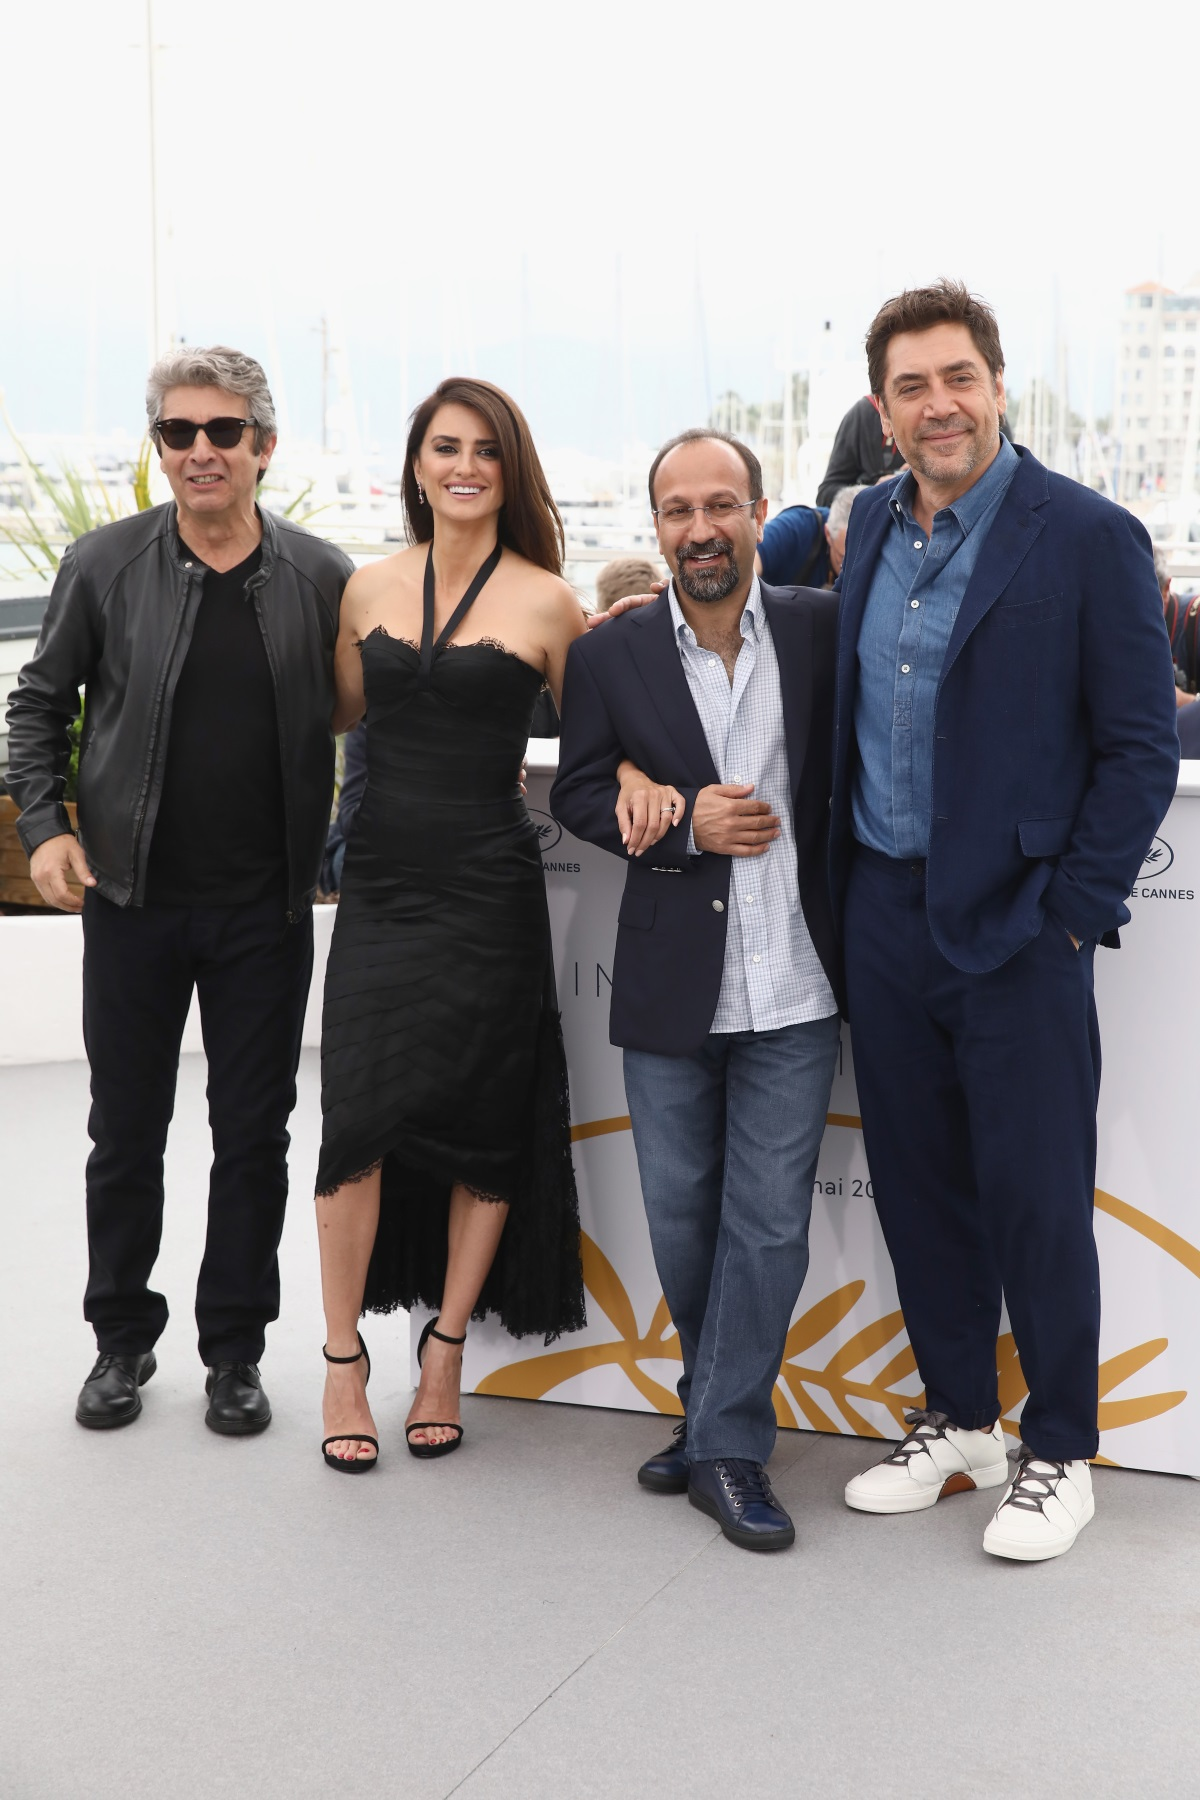 Пенелопе Крус и Хавиер Бардем на червения килим в Кан, заедно с актьора Рикардо Дарин и режисьора Асгар Фархади